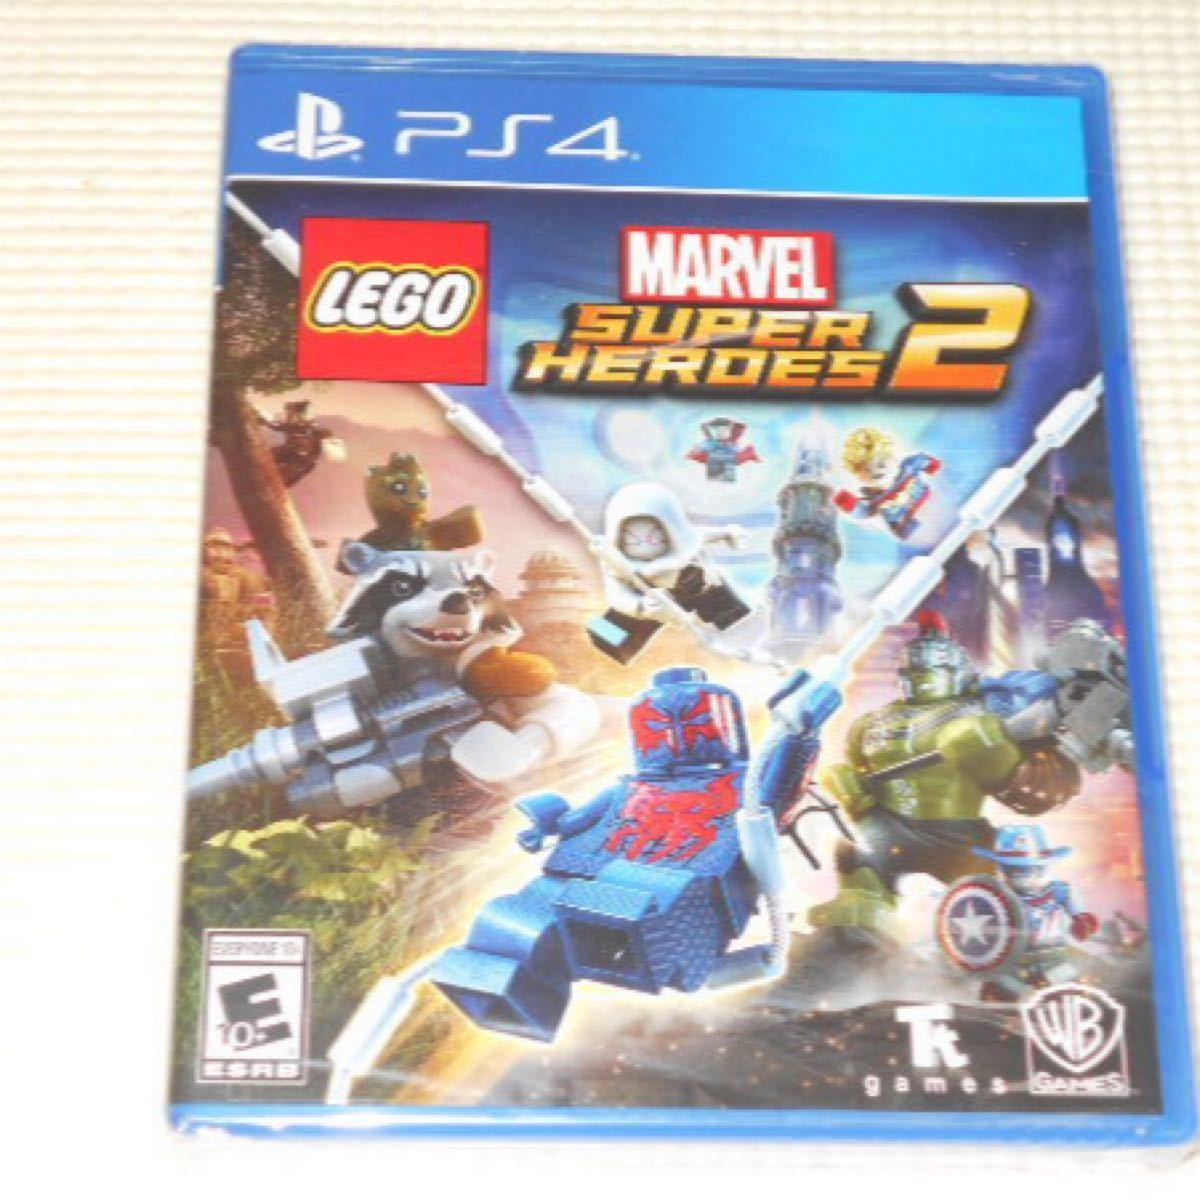 PS4★LEGO MARVEL SUPER HEROES 2 海外版(国内本体動作可能)★新品未開封